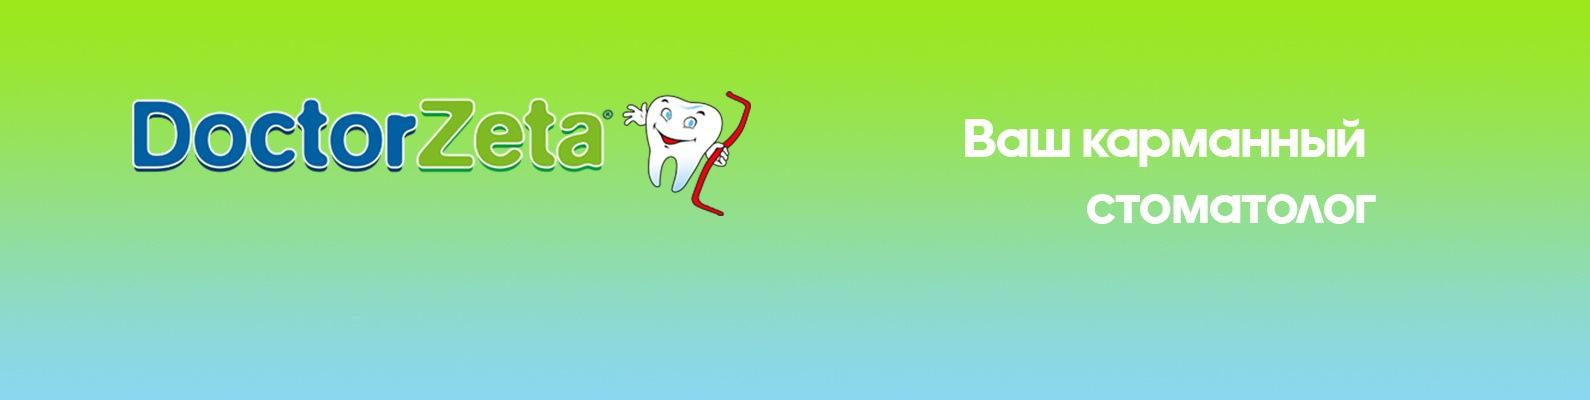 Доктор зета зубочистки